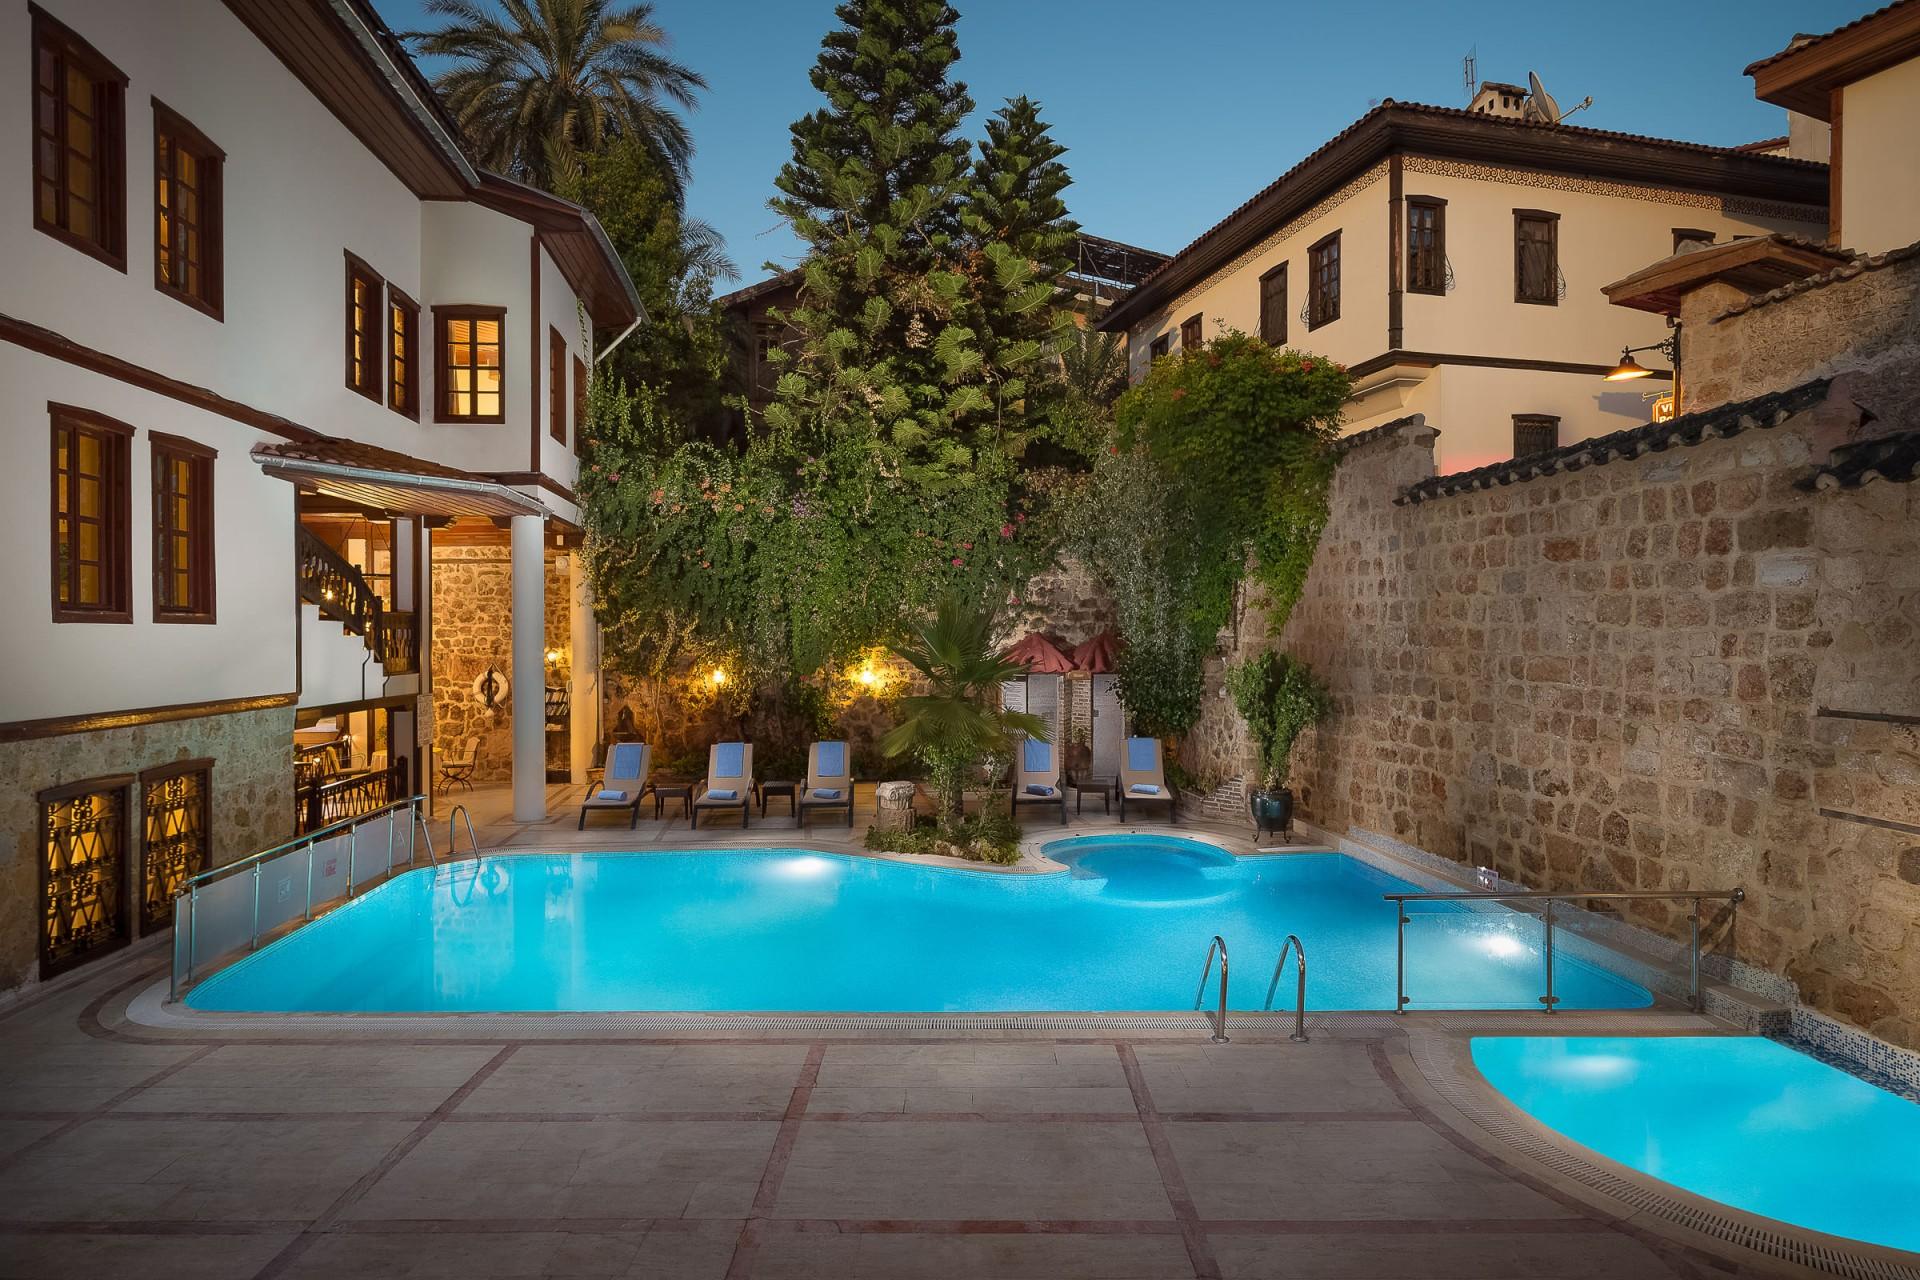 Best Architecture Photographer Antaya Turkey   Prana Resorts Dogan Hotel Swimming Pool Photography Kaleici